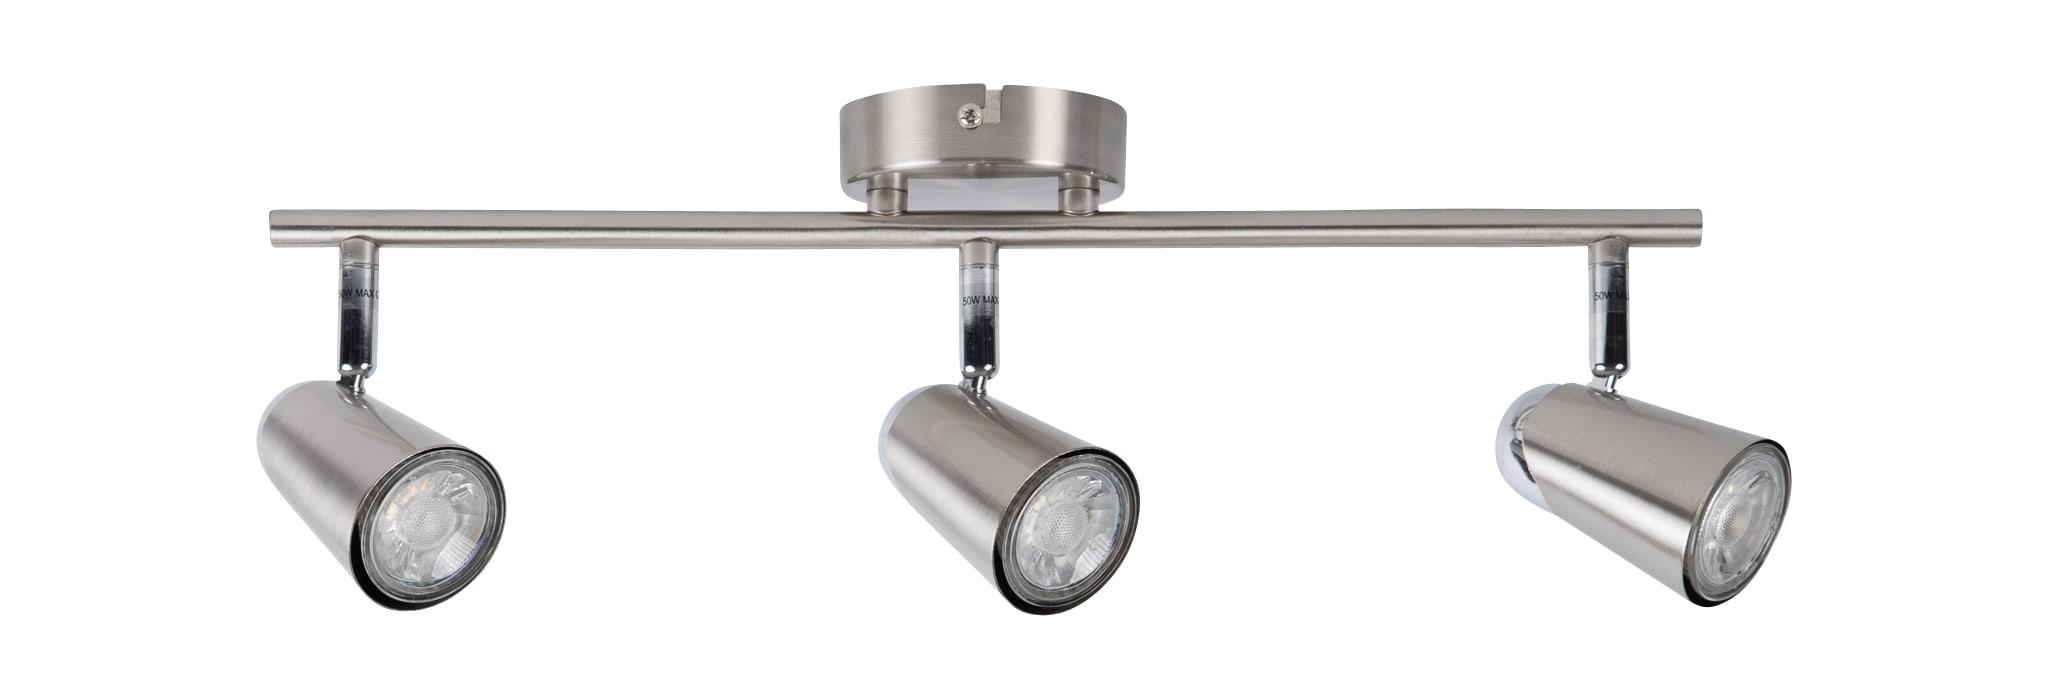 Modern Silver Brushed Chrome 3 Way Spotlight Bar Kitchen Ceiling Spot Light 710560386918 Ebay